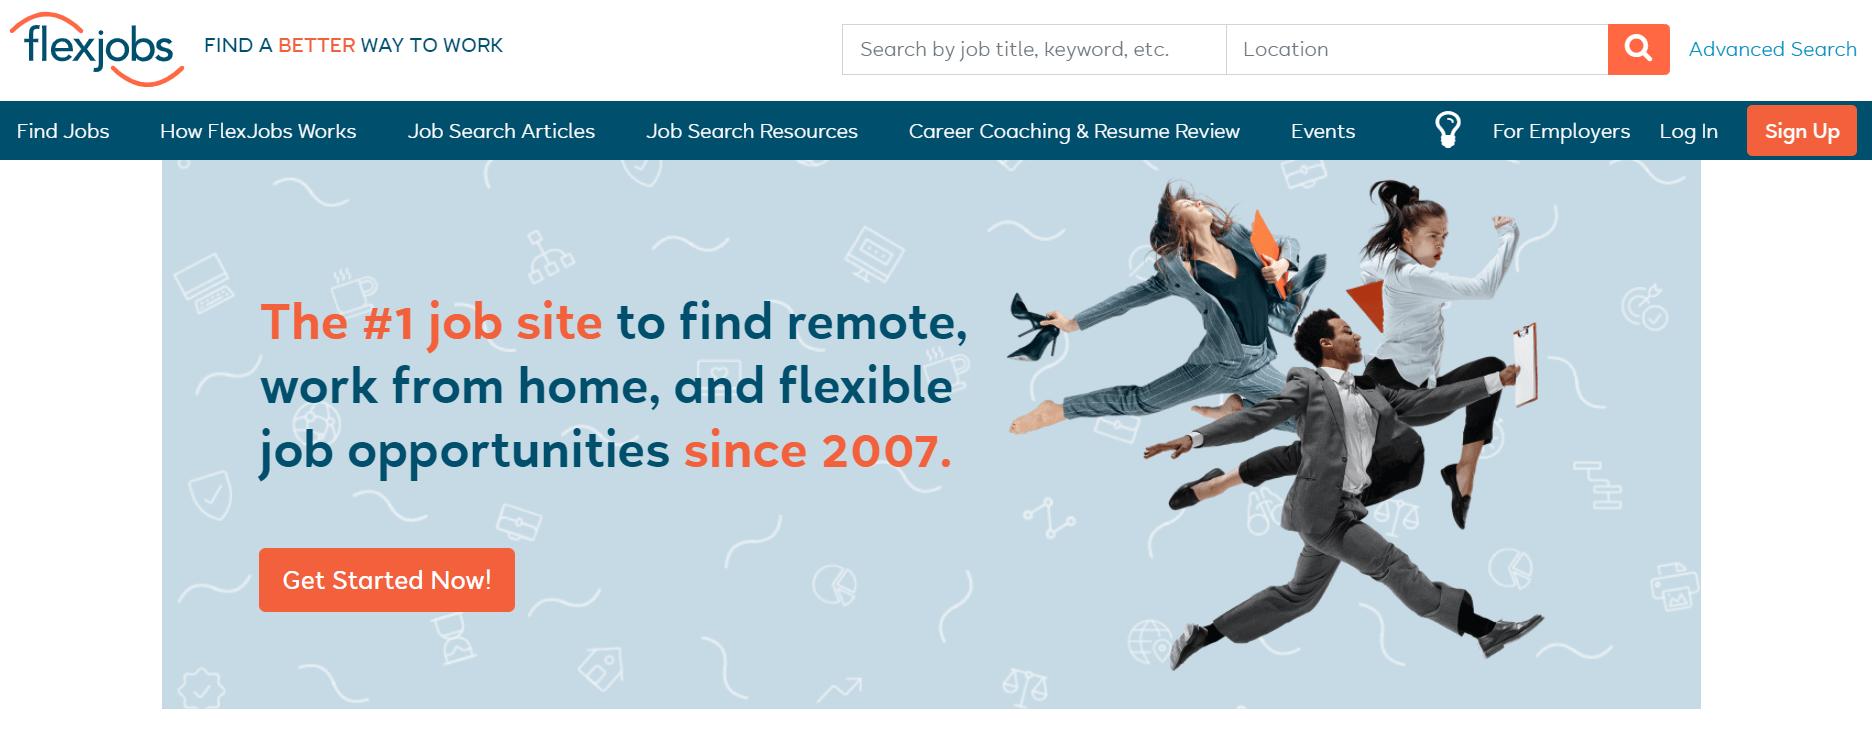 Flexjobs主页。